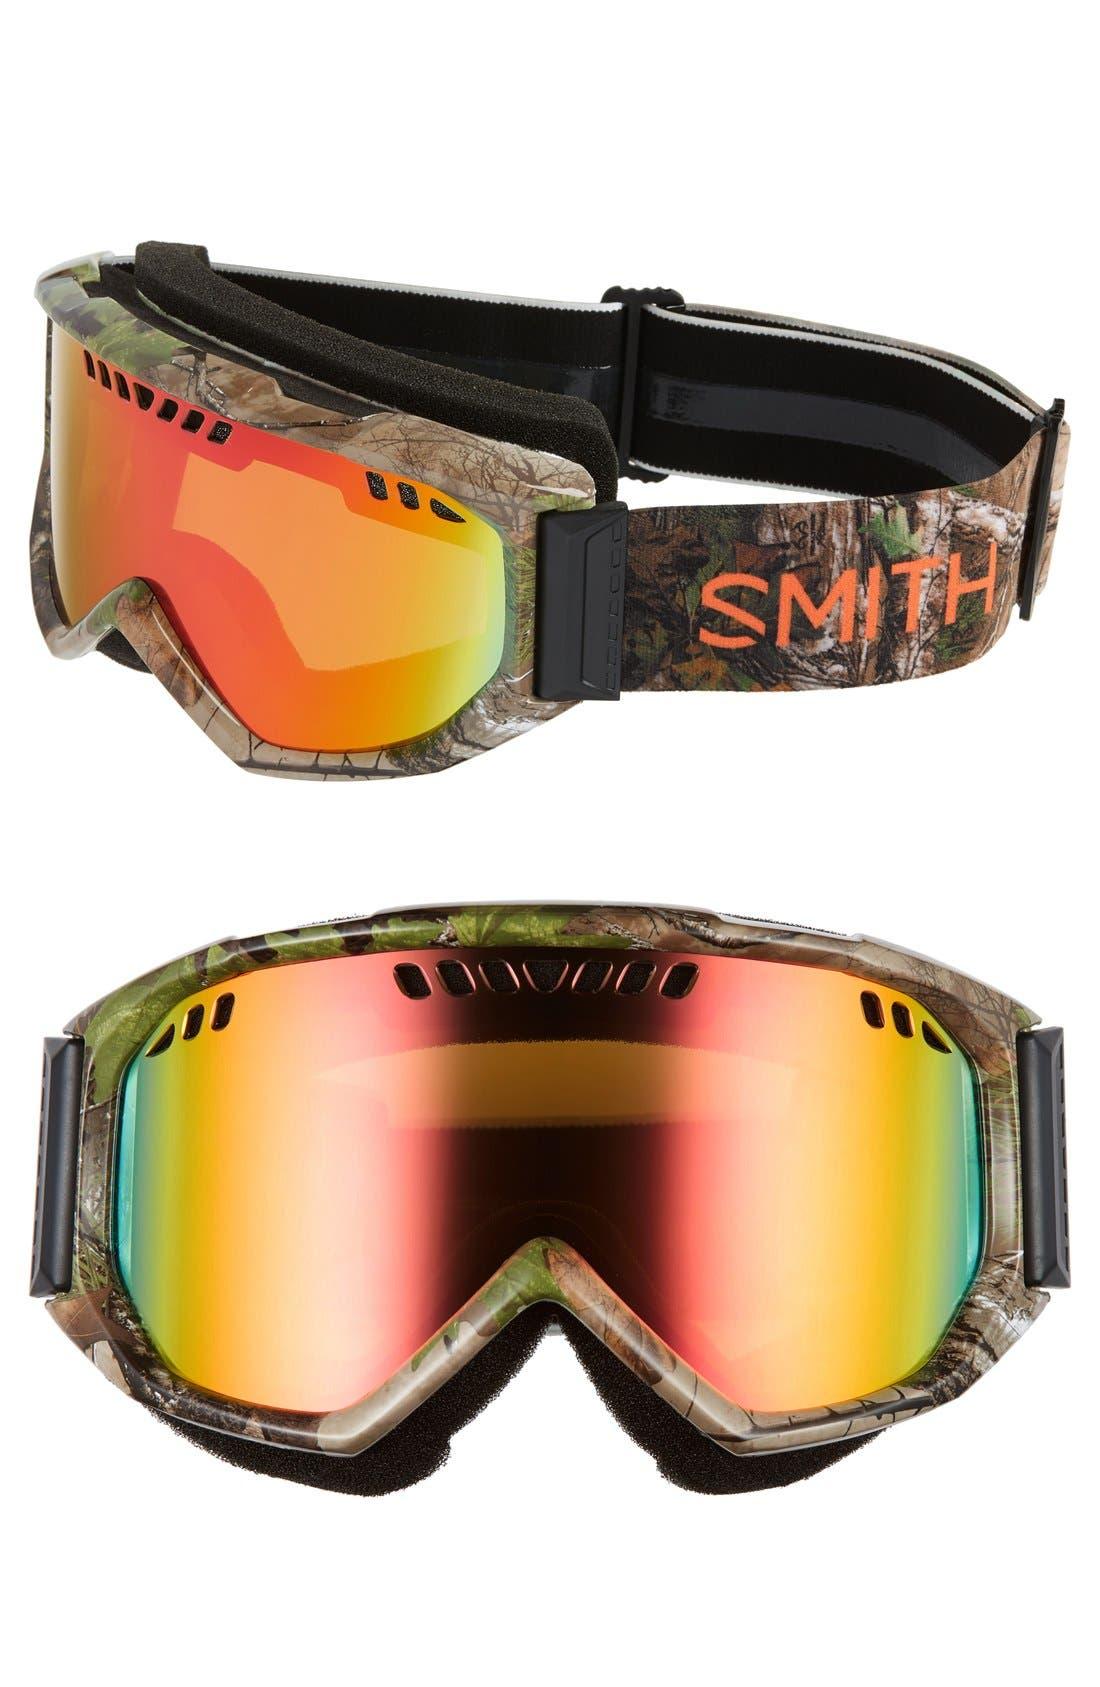 Smith Scope 175mm Snow Goggles